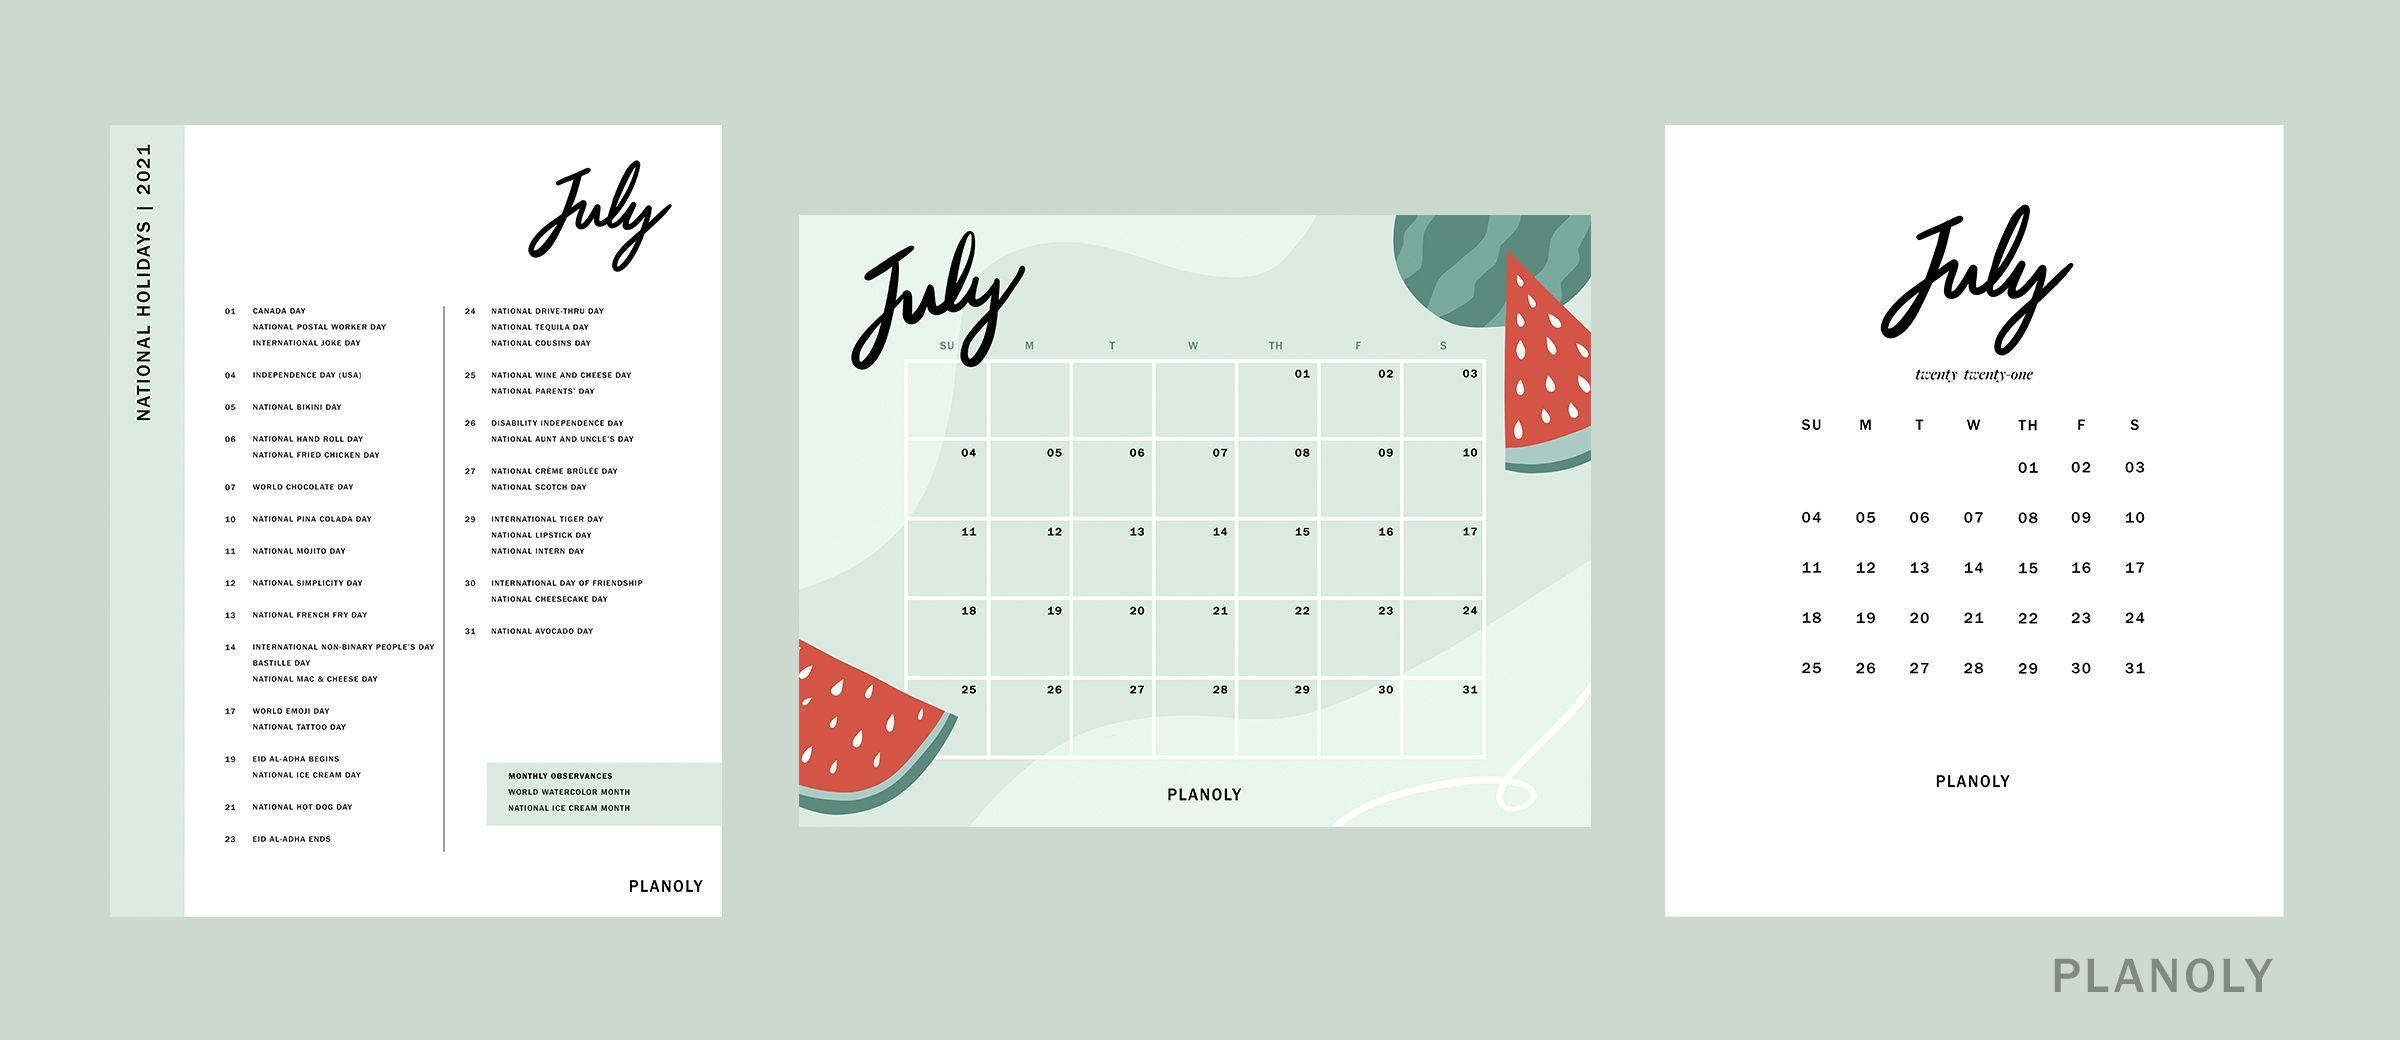 PLANOLY-Blog Post-Q3 Content Calendars-Image 1